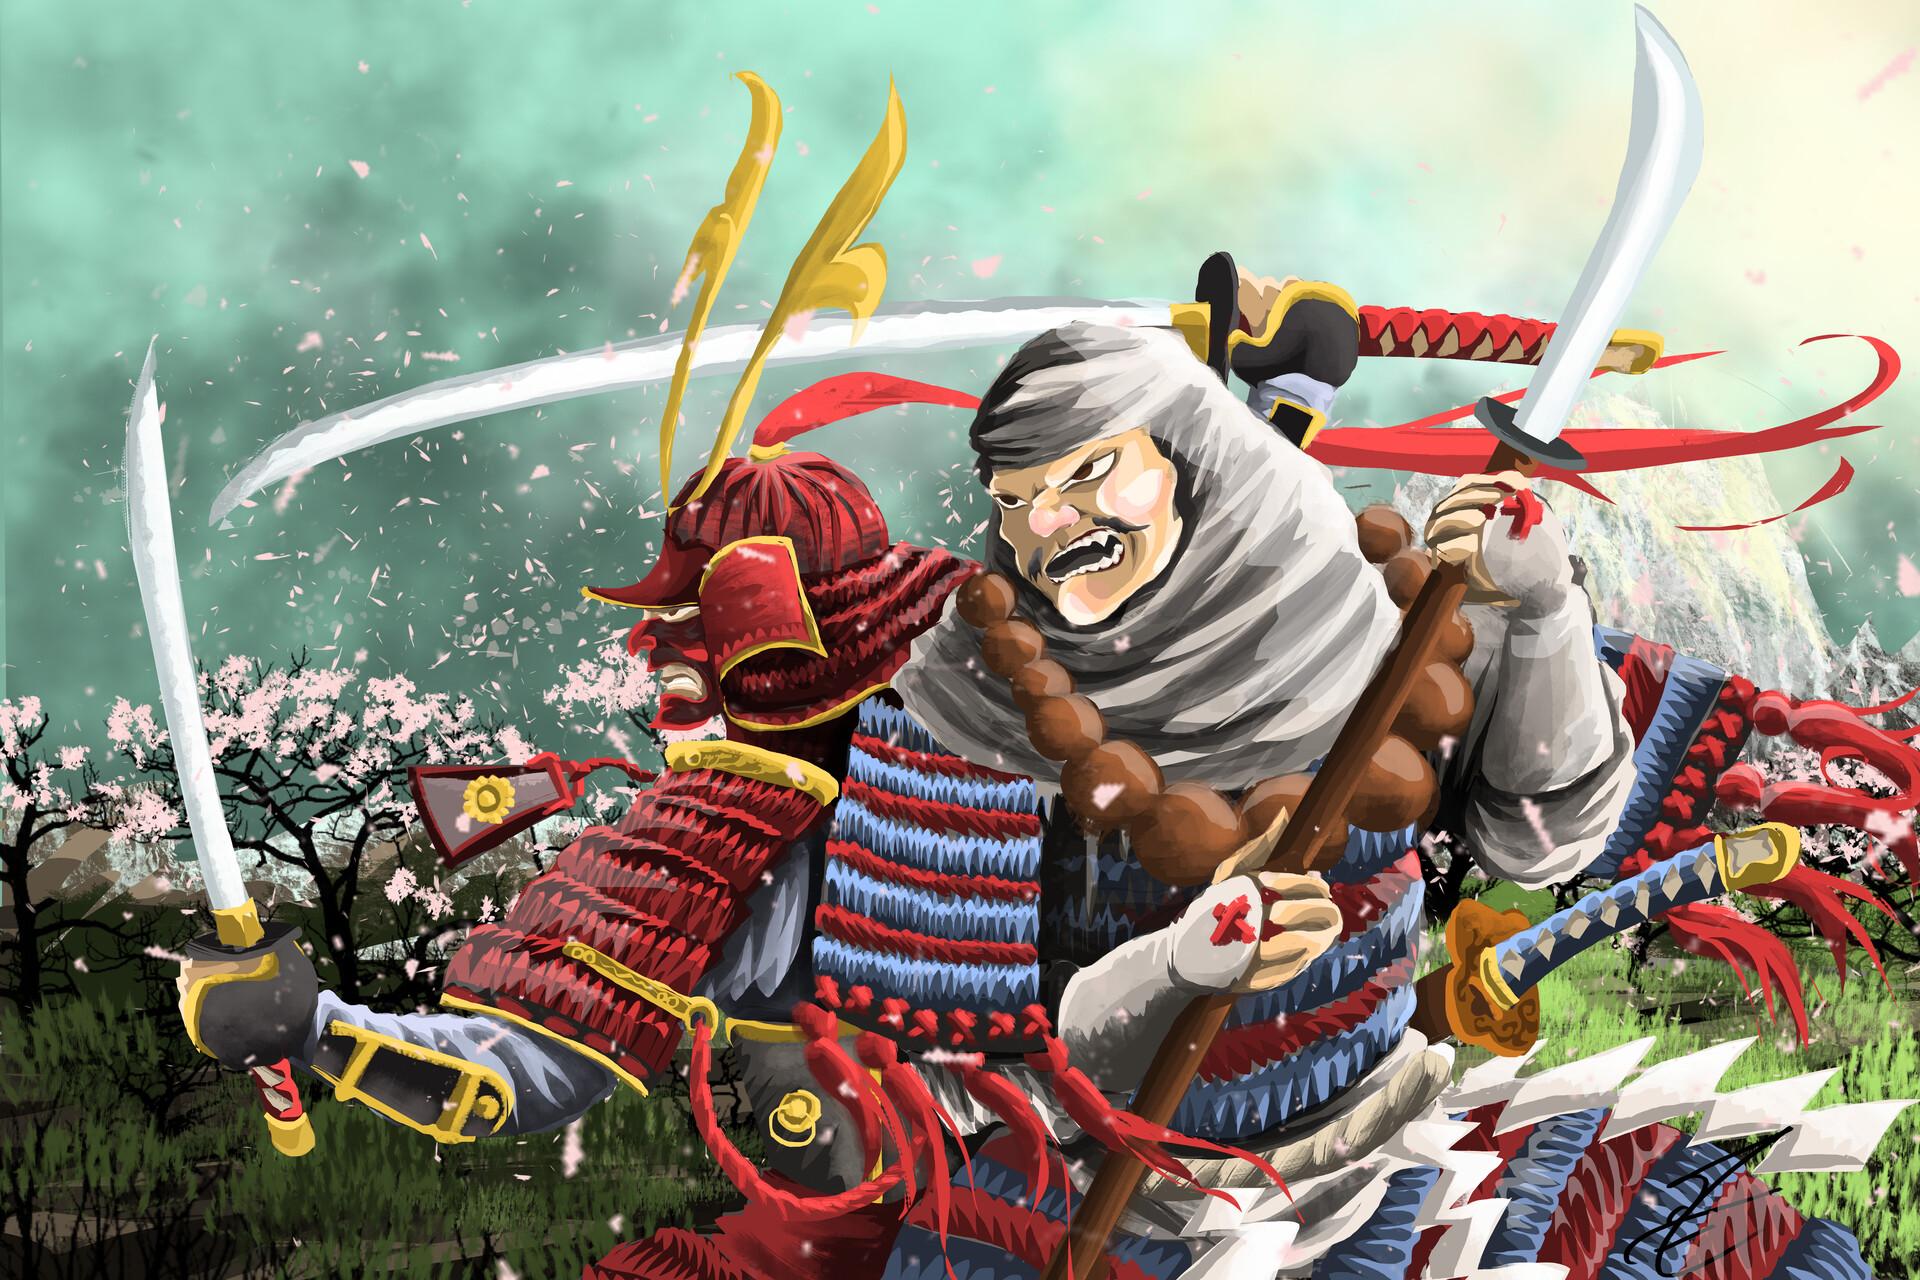 Mathieu Tran Minamoto And Benkei Benkei is the name of hero in 12 century. mathieu tran minamoto and benkei